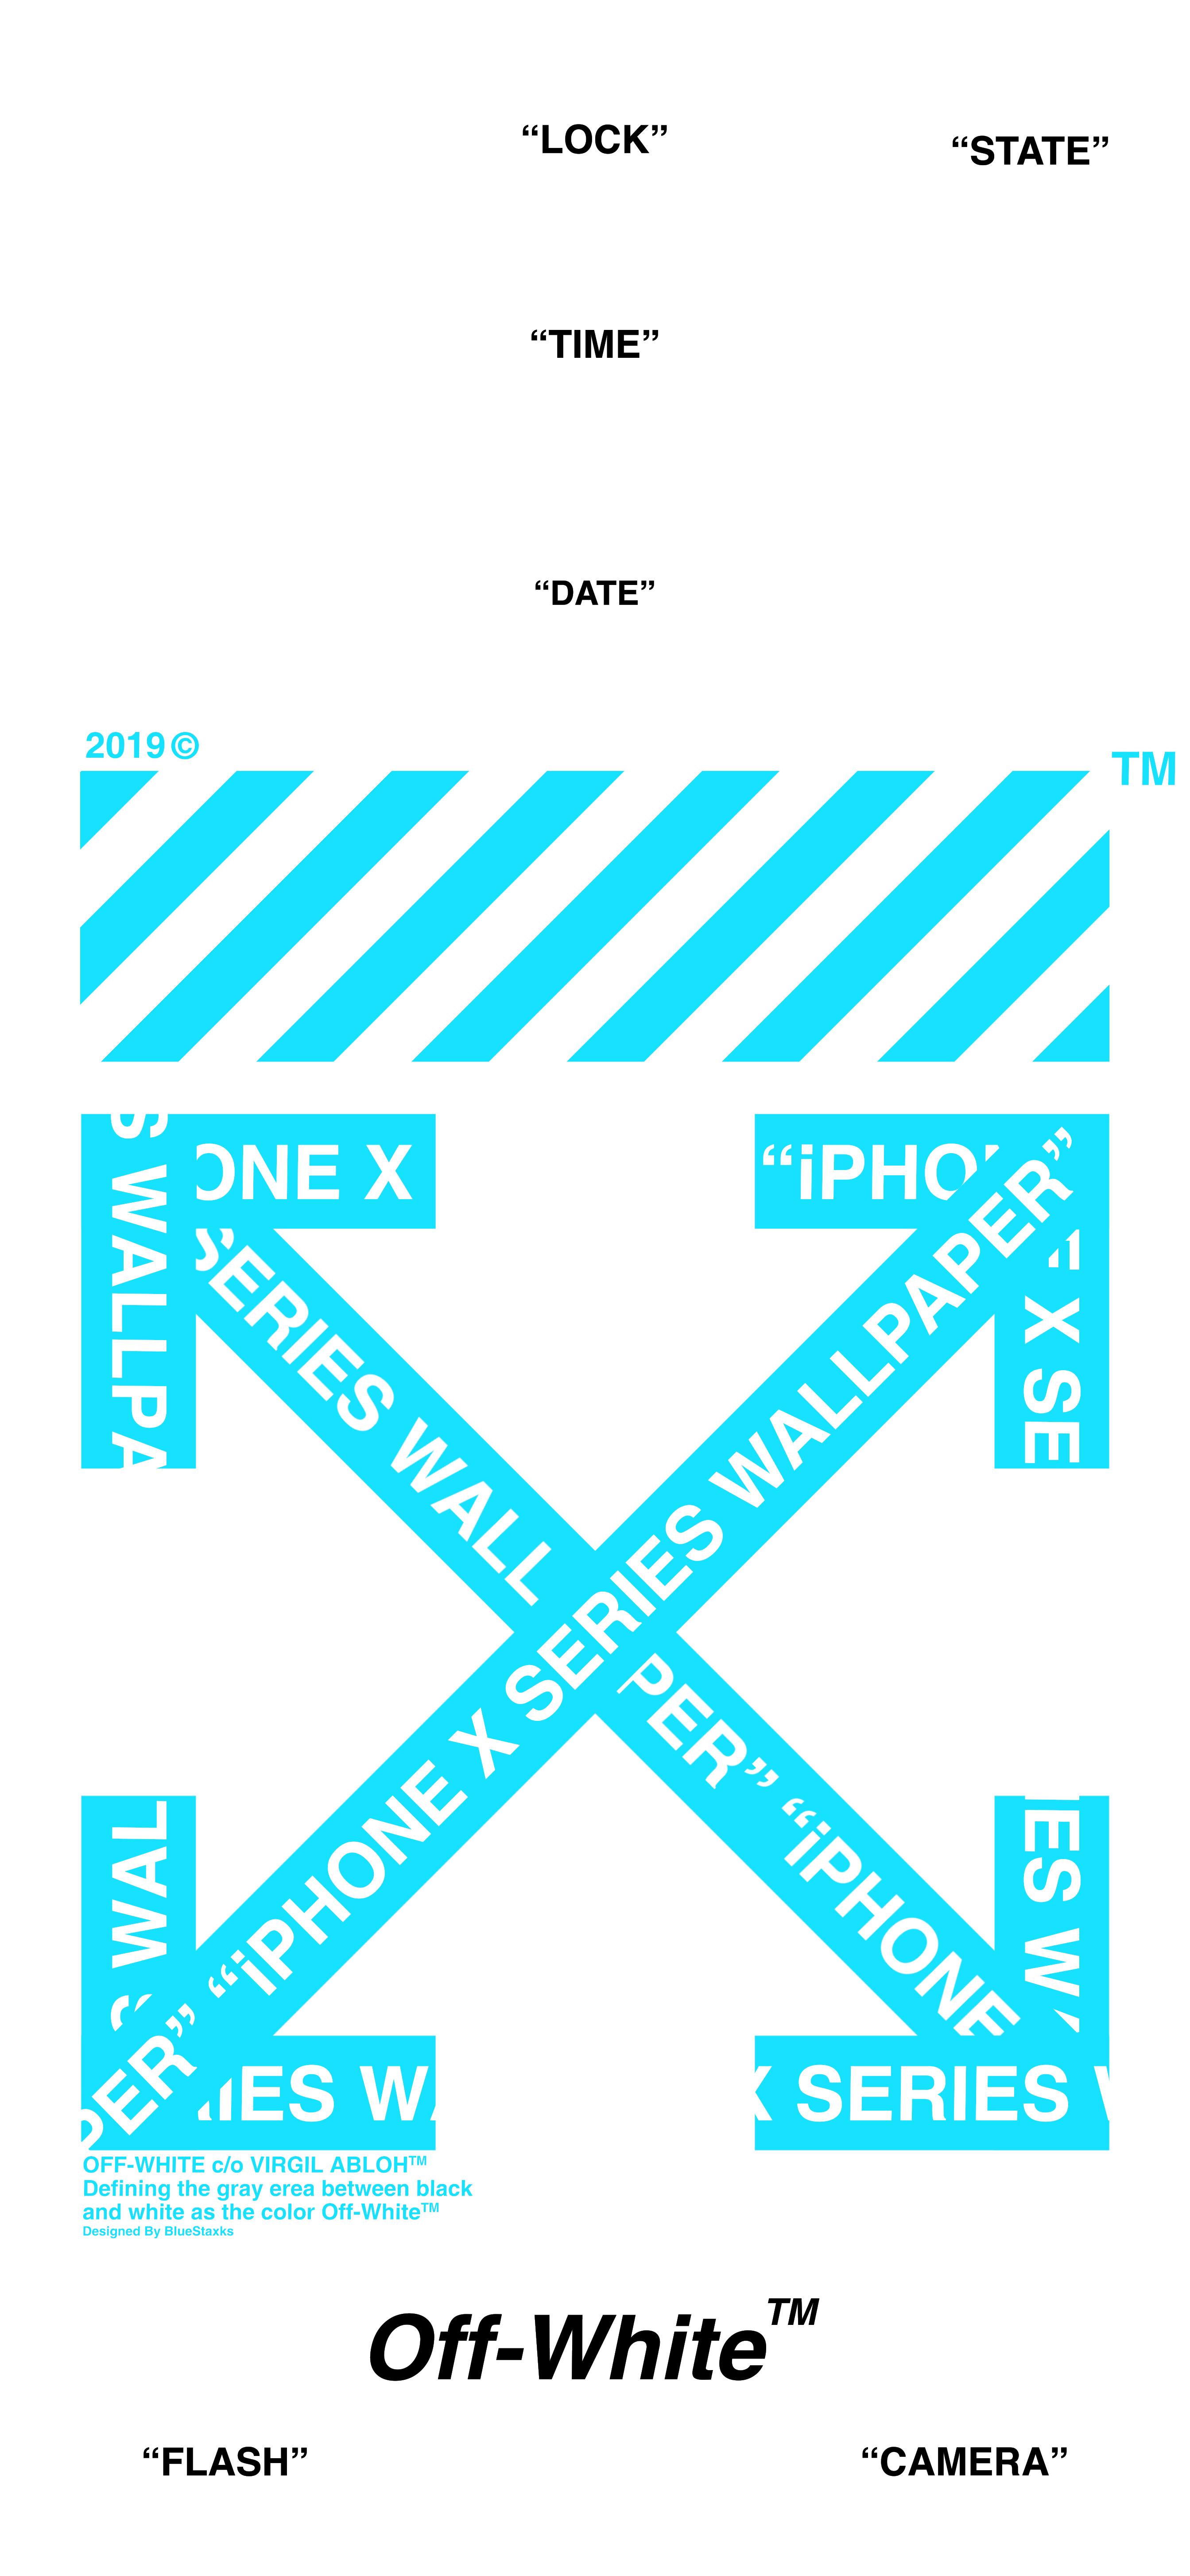 Offwhite Wallpaper 2 Remake 4k Iphone Wallpaper Off White White Wallpaper For Iphone Hypebeast Iphone Wallpaper